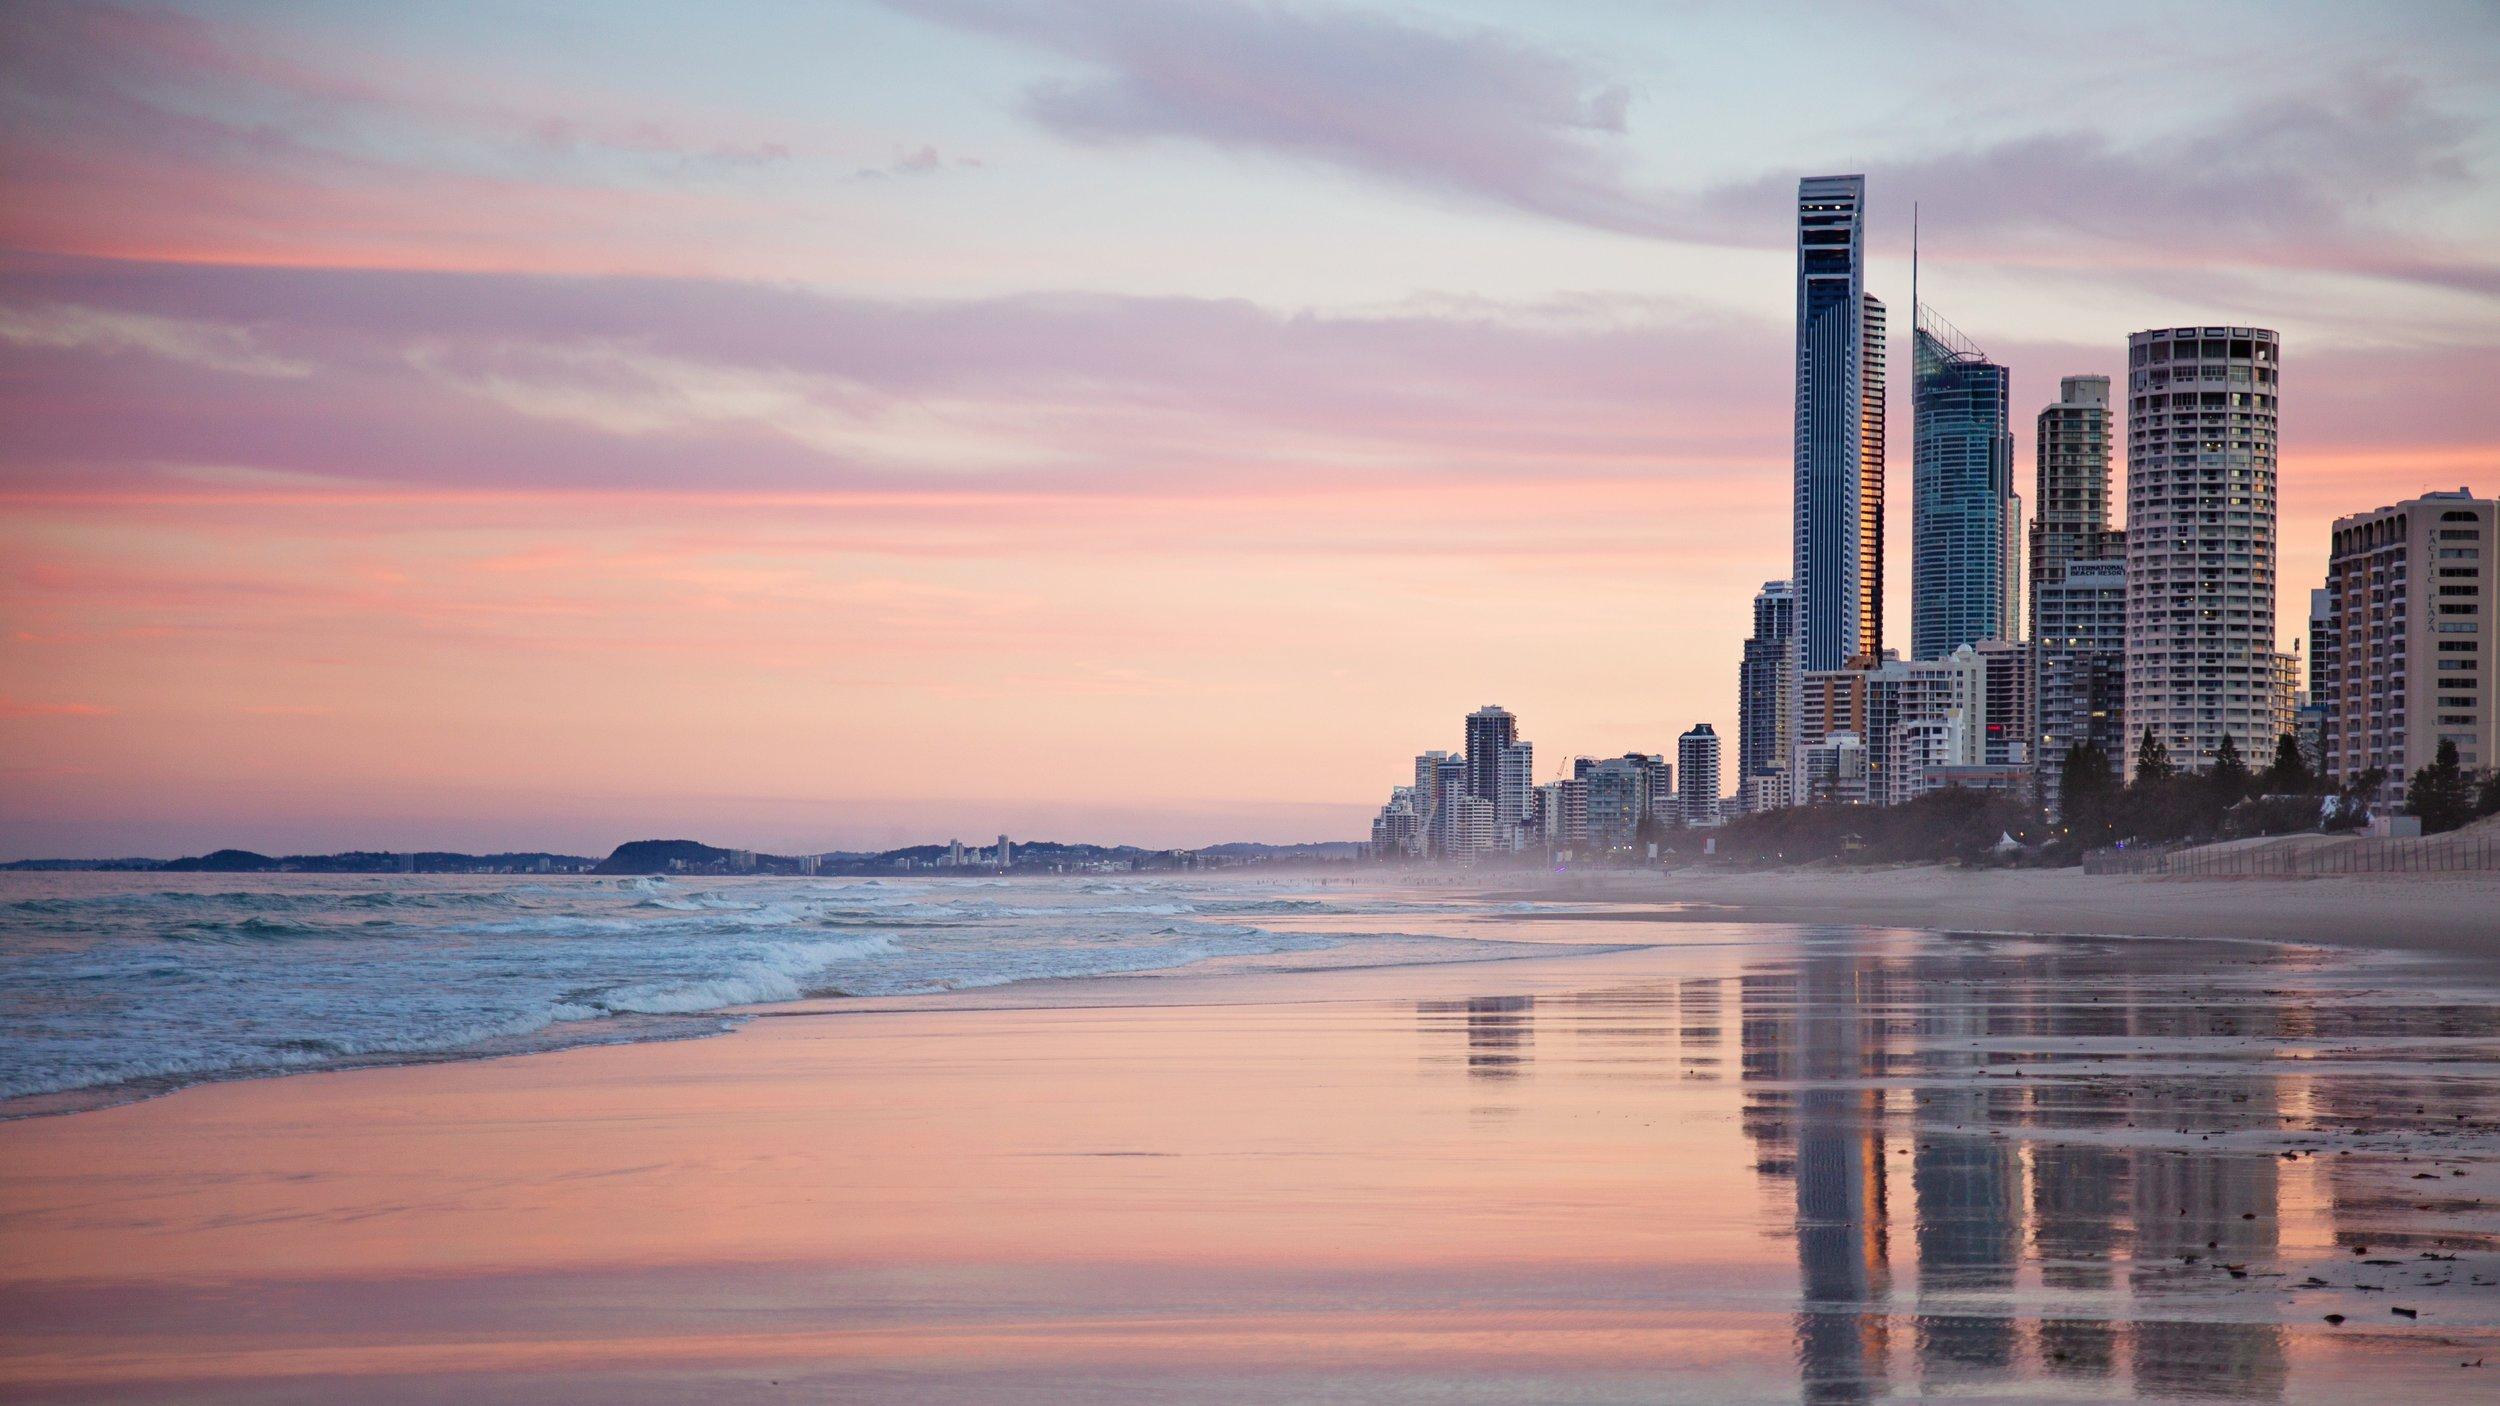 architecture-australia-backlit-634010.jpg